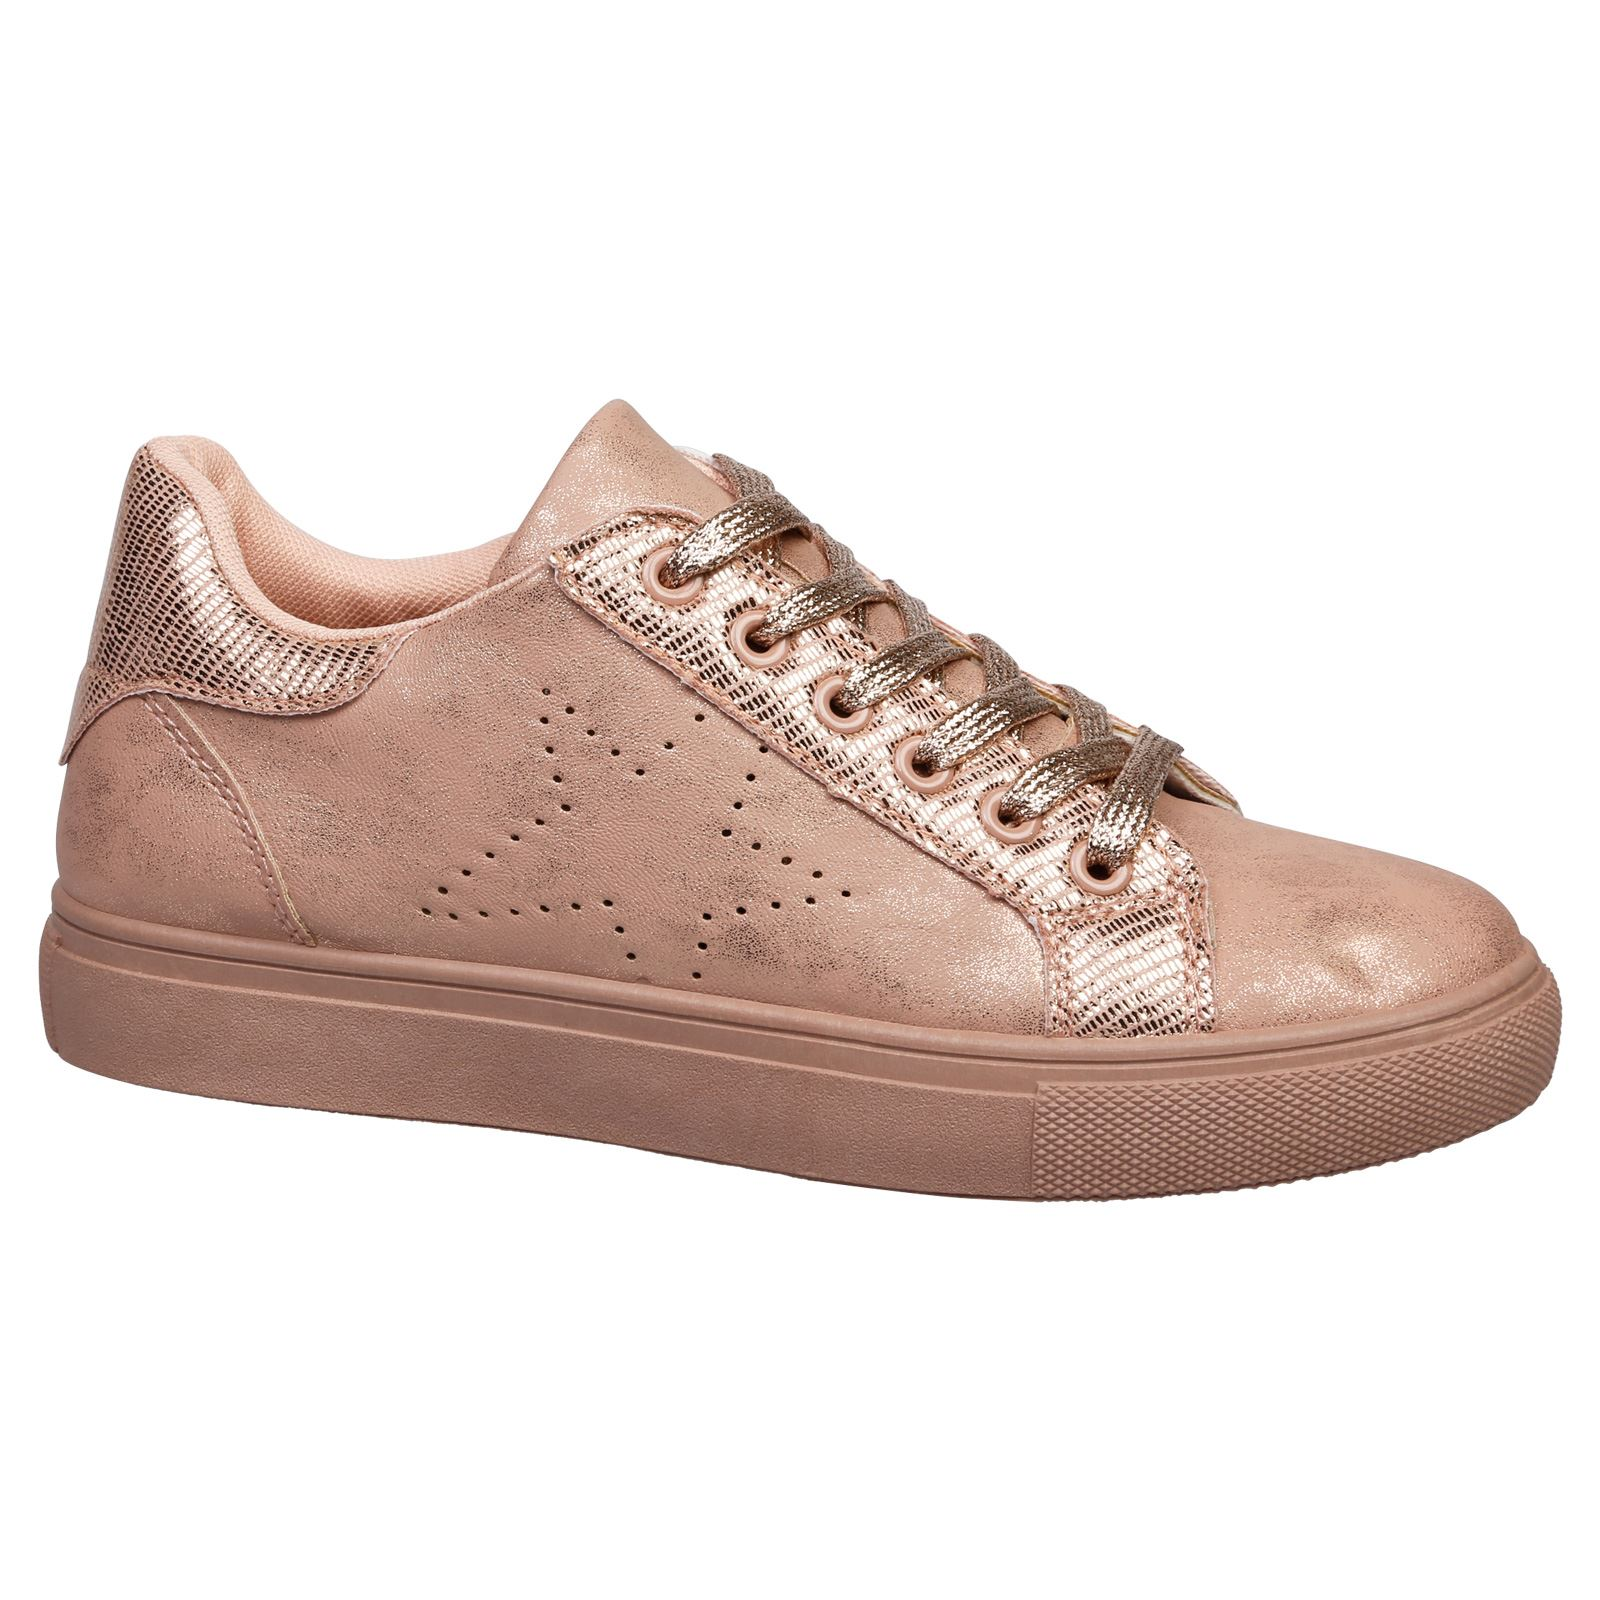 DRAKE-Da-Donna-Ballerine-Tacco-Basso-Lacci-Scarpe-Da-Ginnastica-Scarpe-Da-Donna-Skater-POMPE